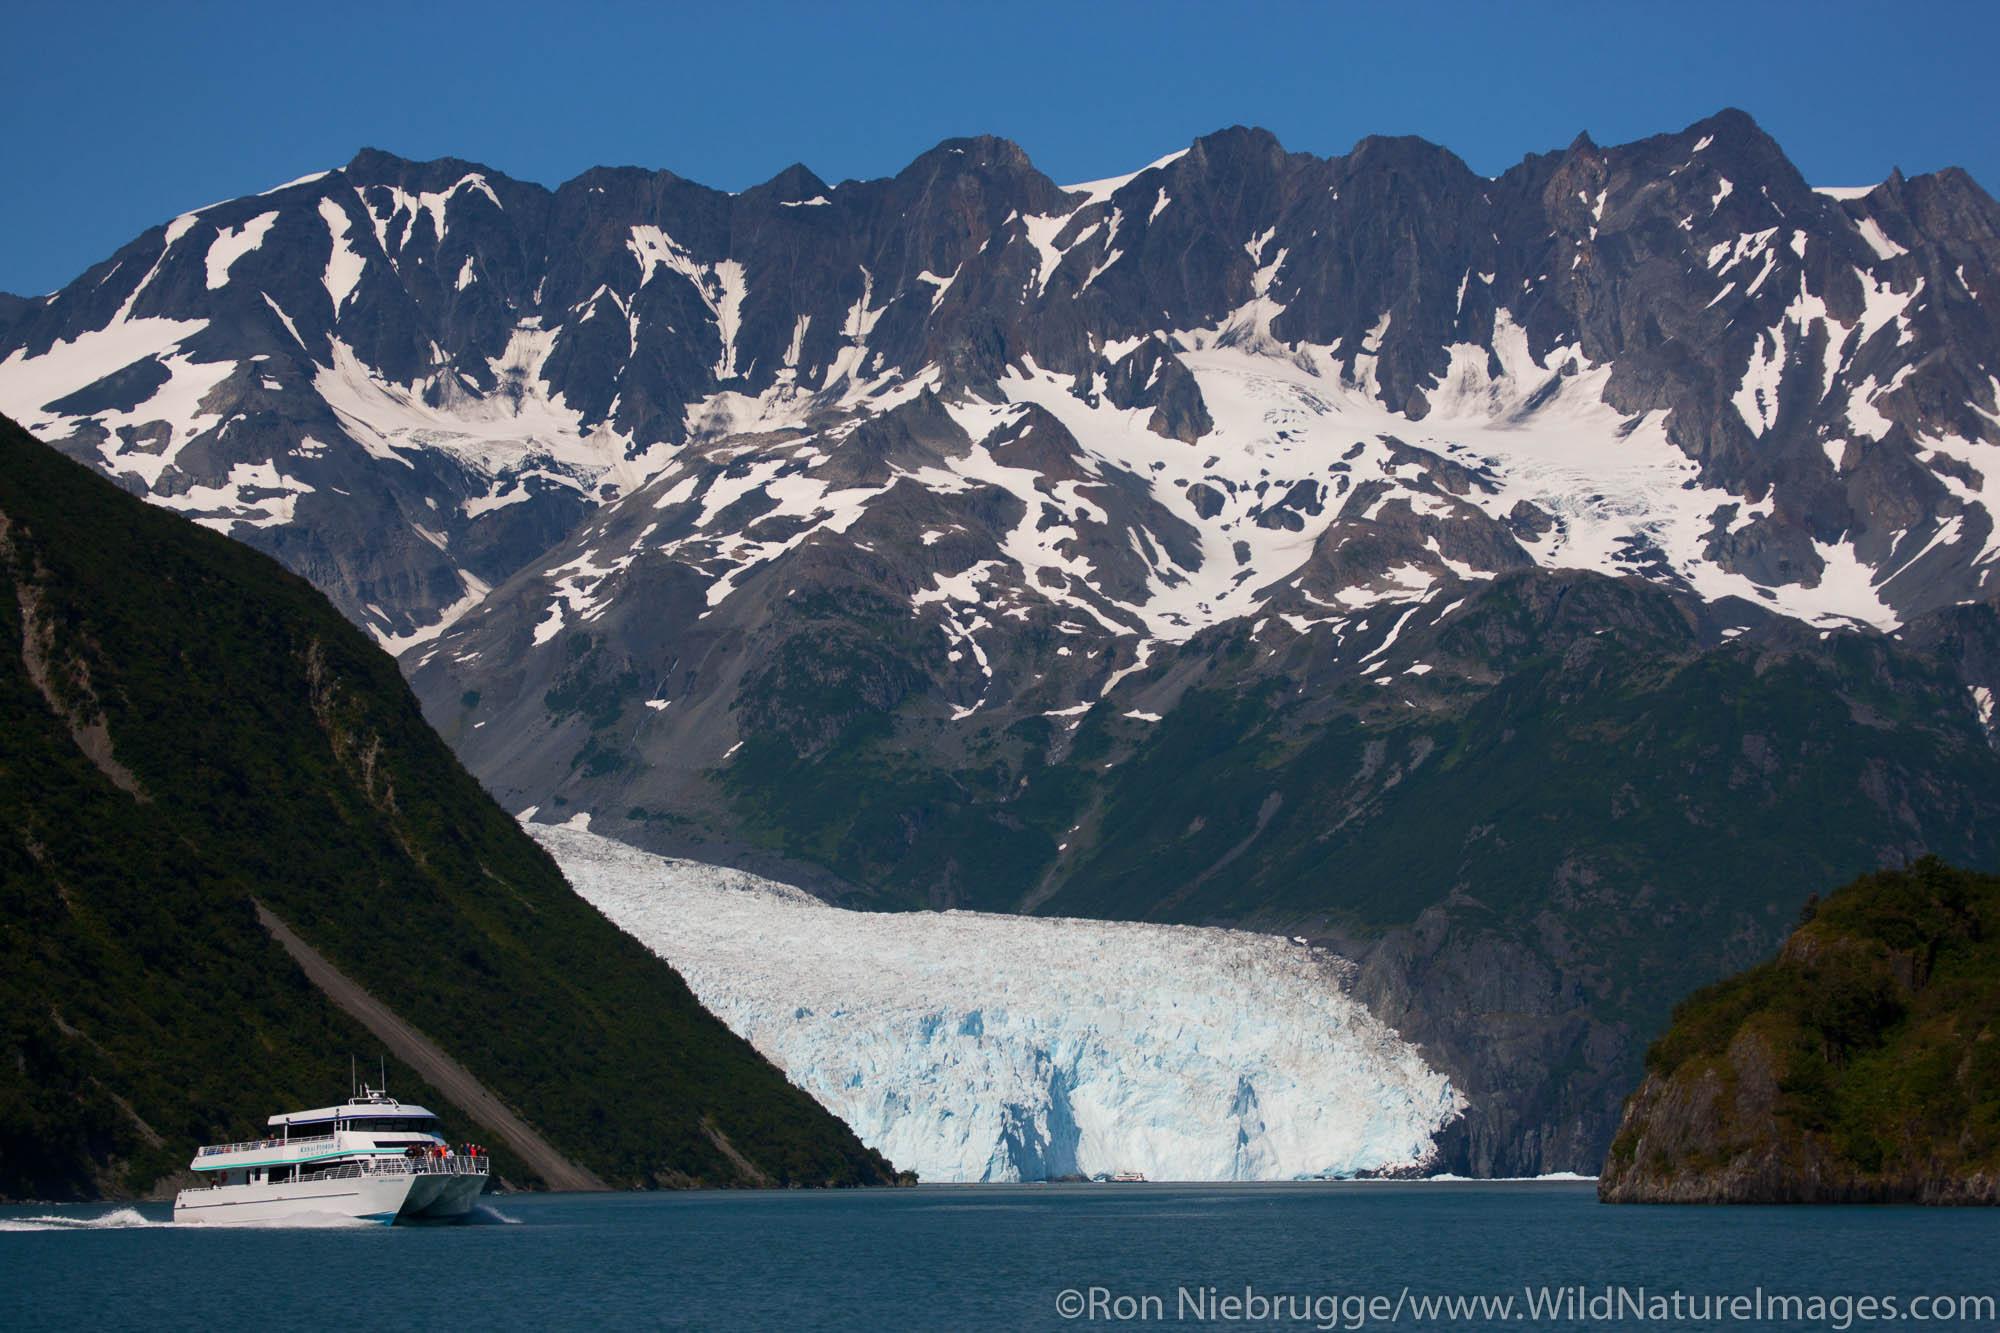 M/V Orca Voyager, Aialik Glacier, Kenai Fjords National Park, near Seward, Alaska.